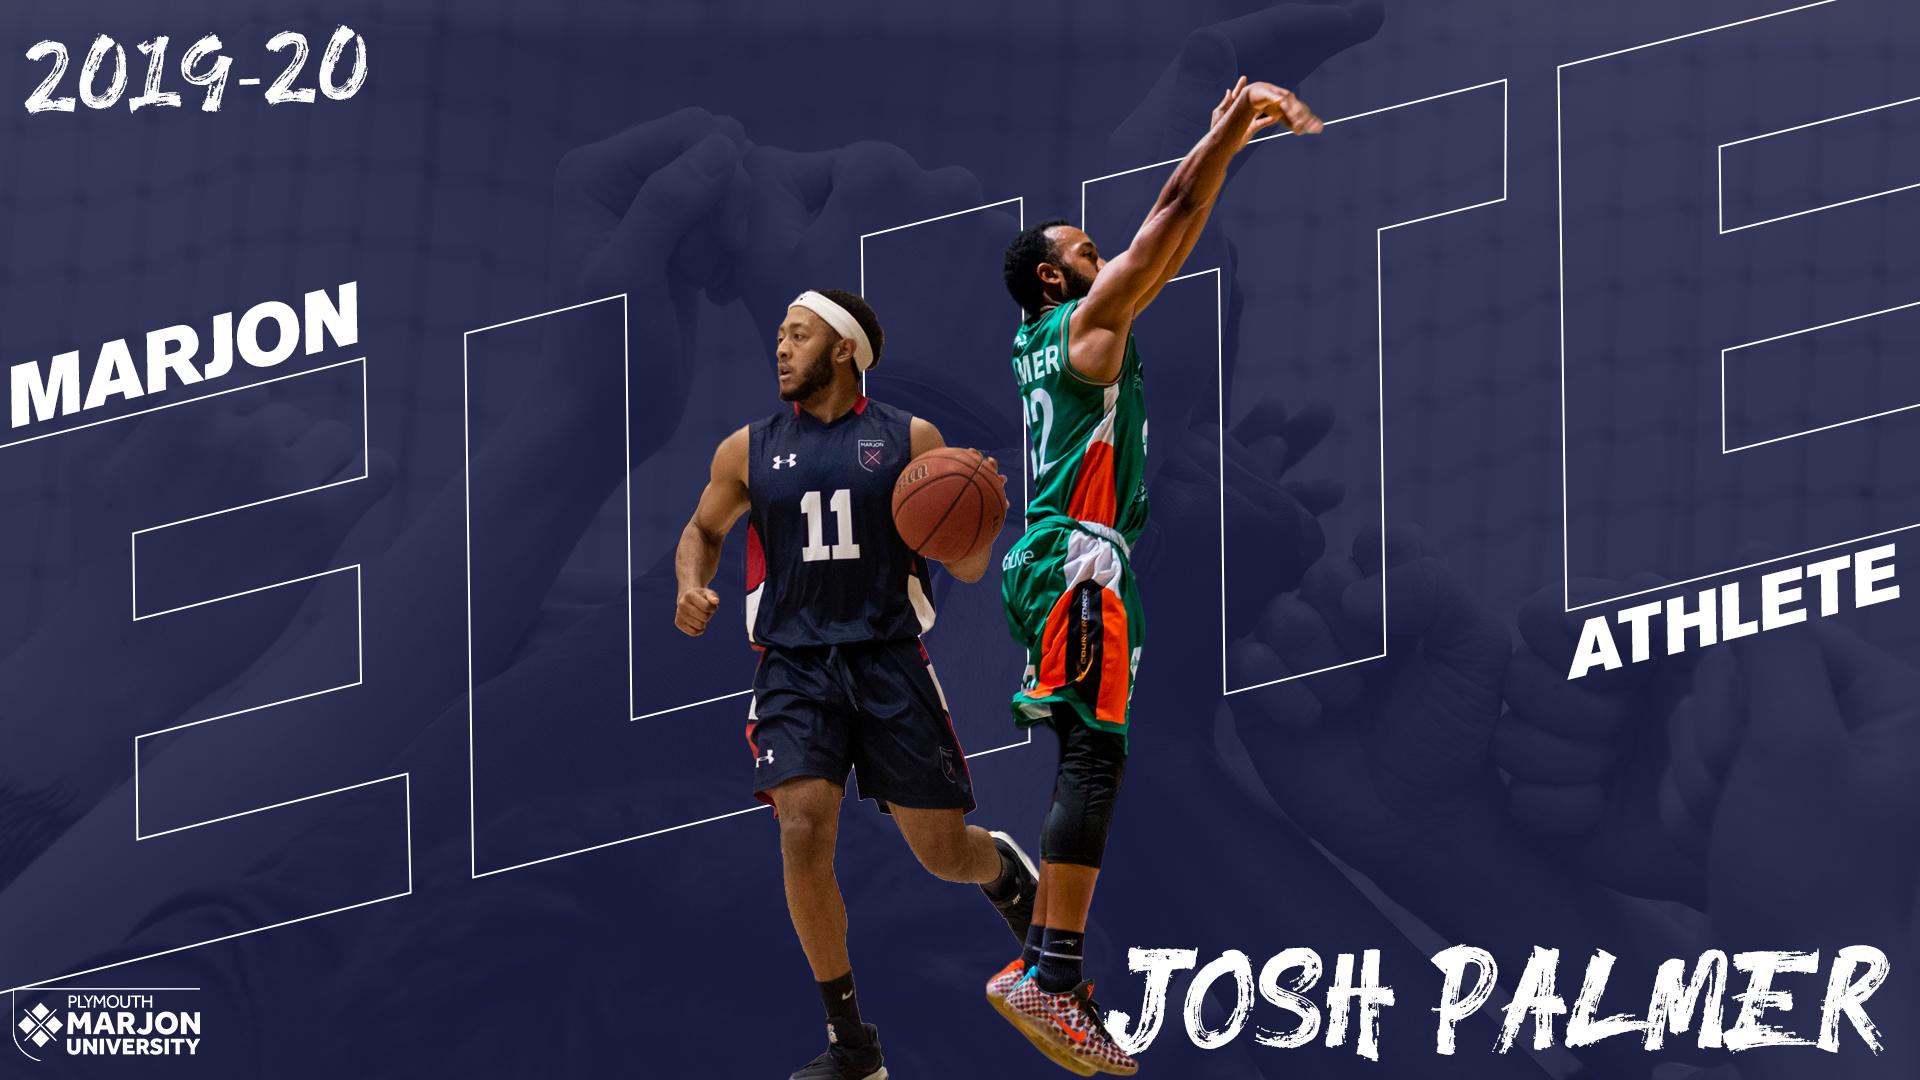 Josh Palmer.png